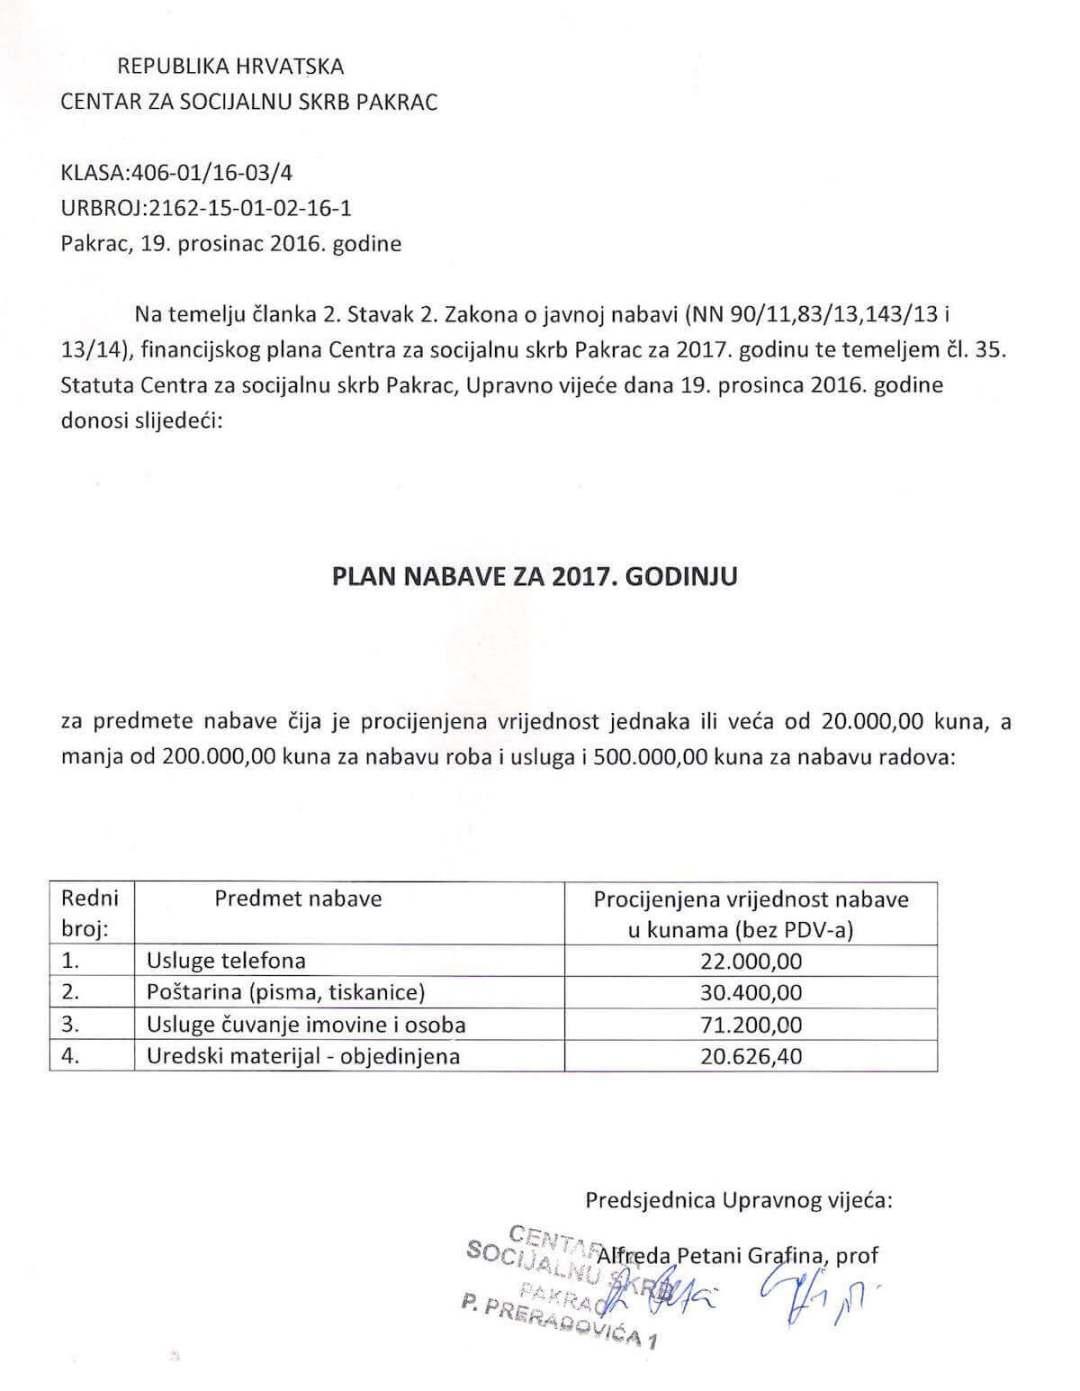 Plan nabave Centra za socijalnu skrb Pakrac za 2017. godinu